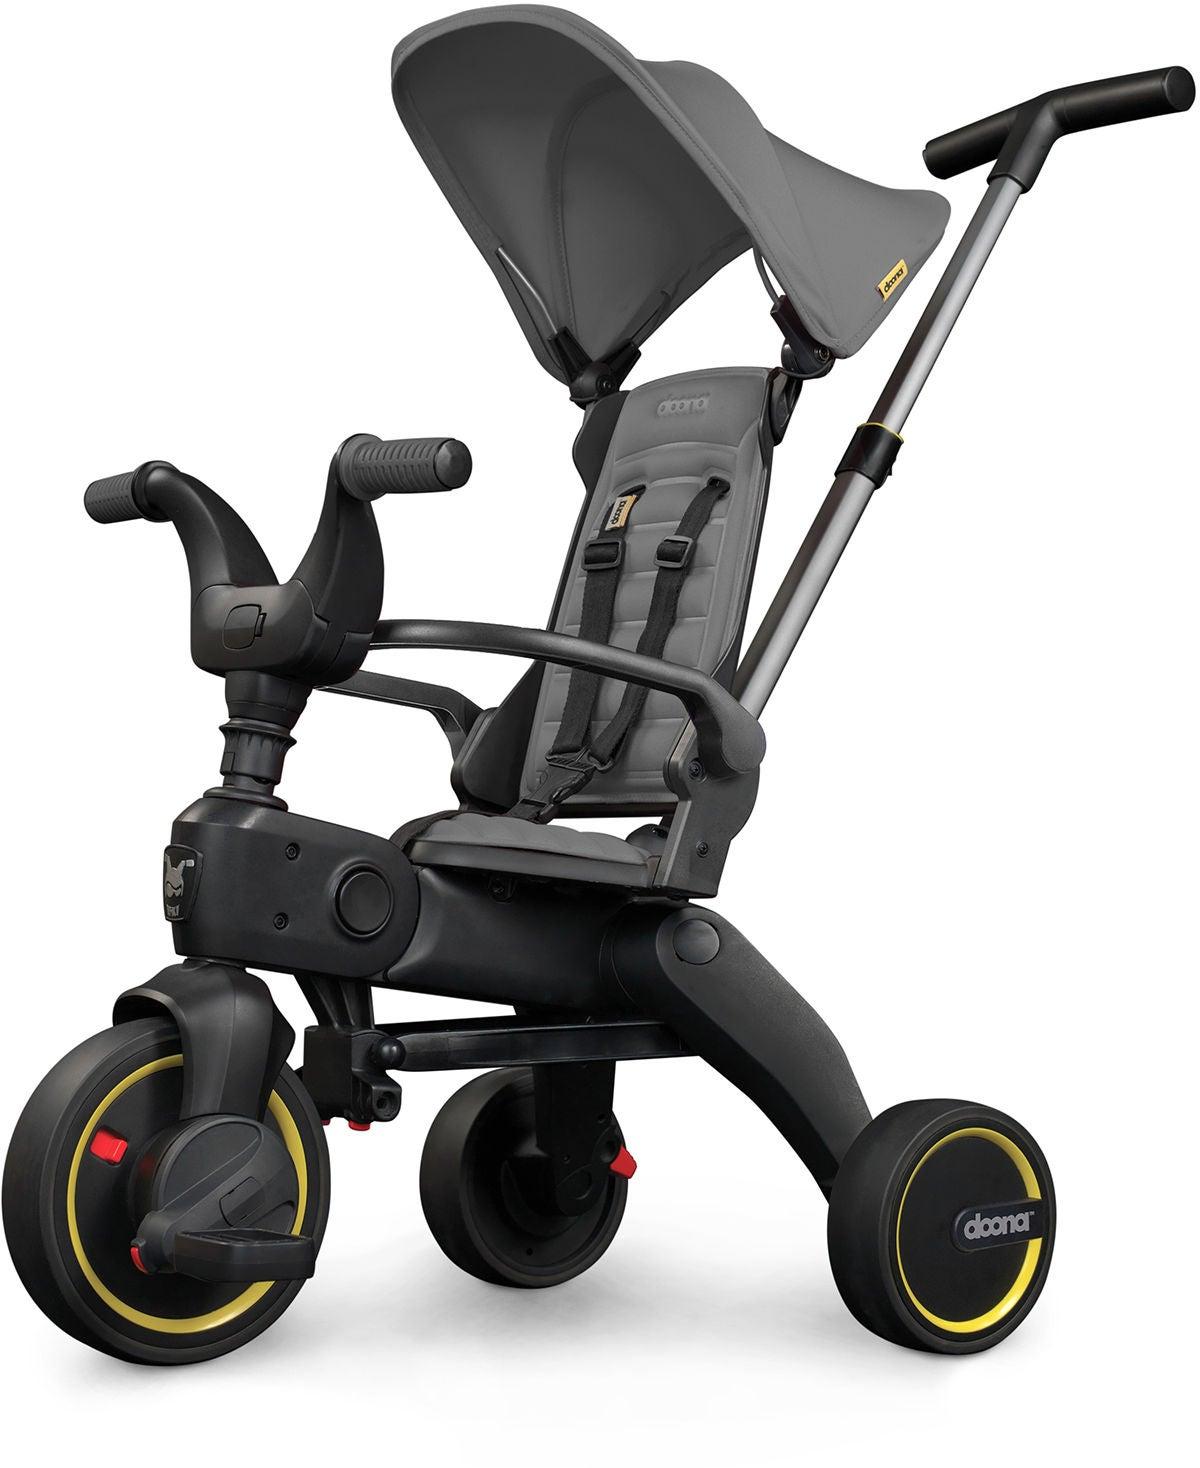 Doona Liki S1 Trehjuling Grey Hound